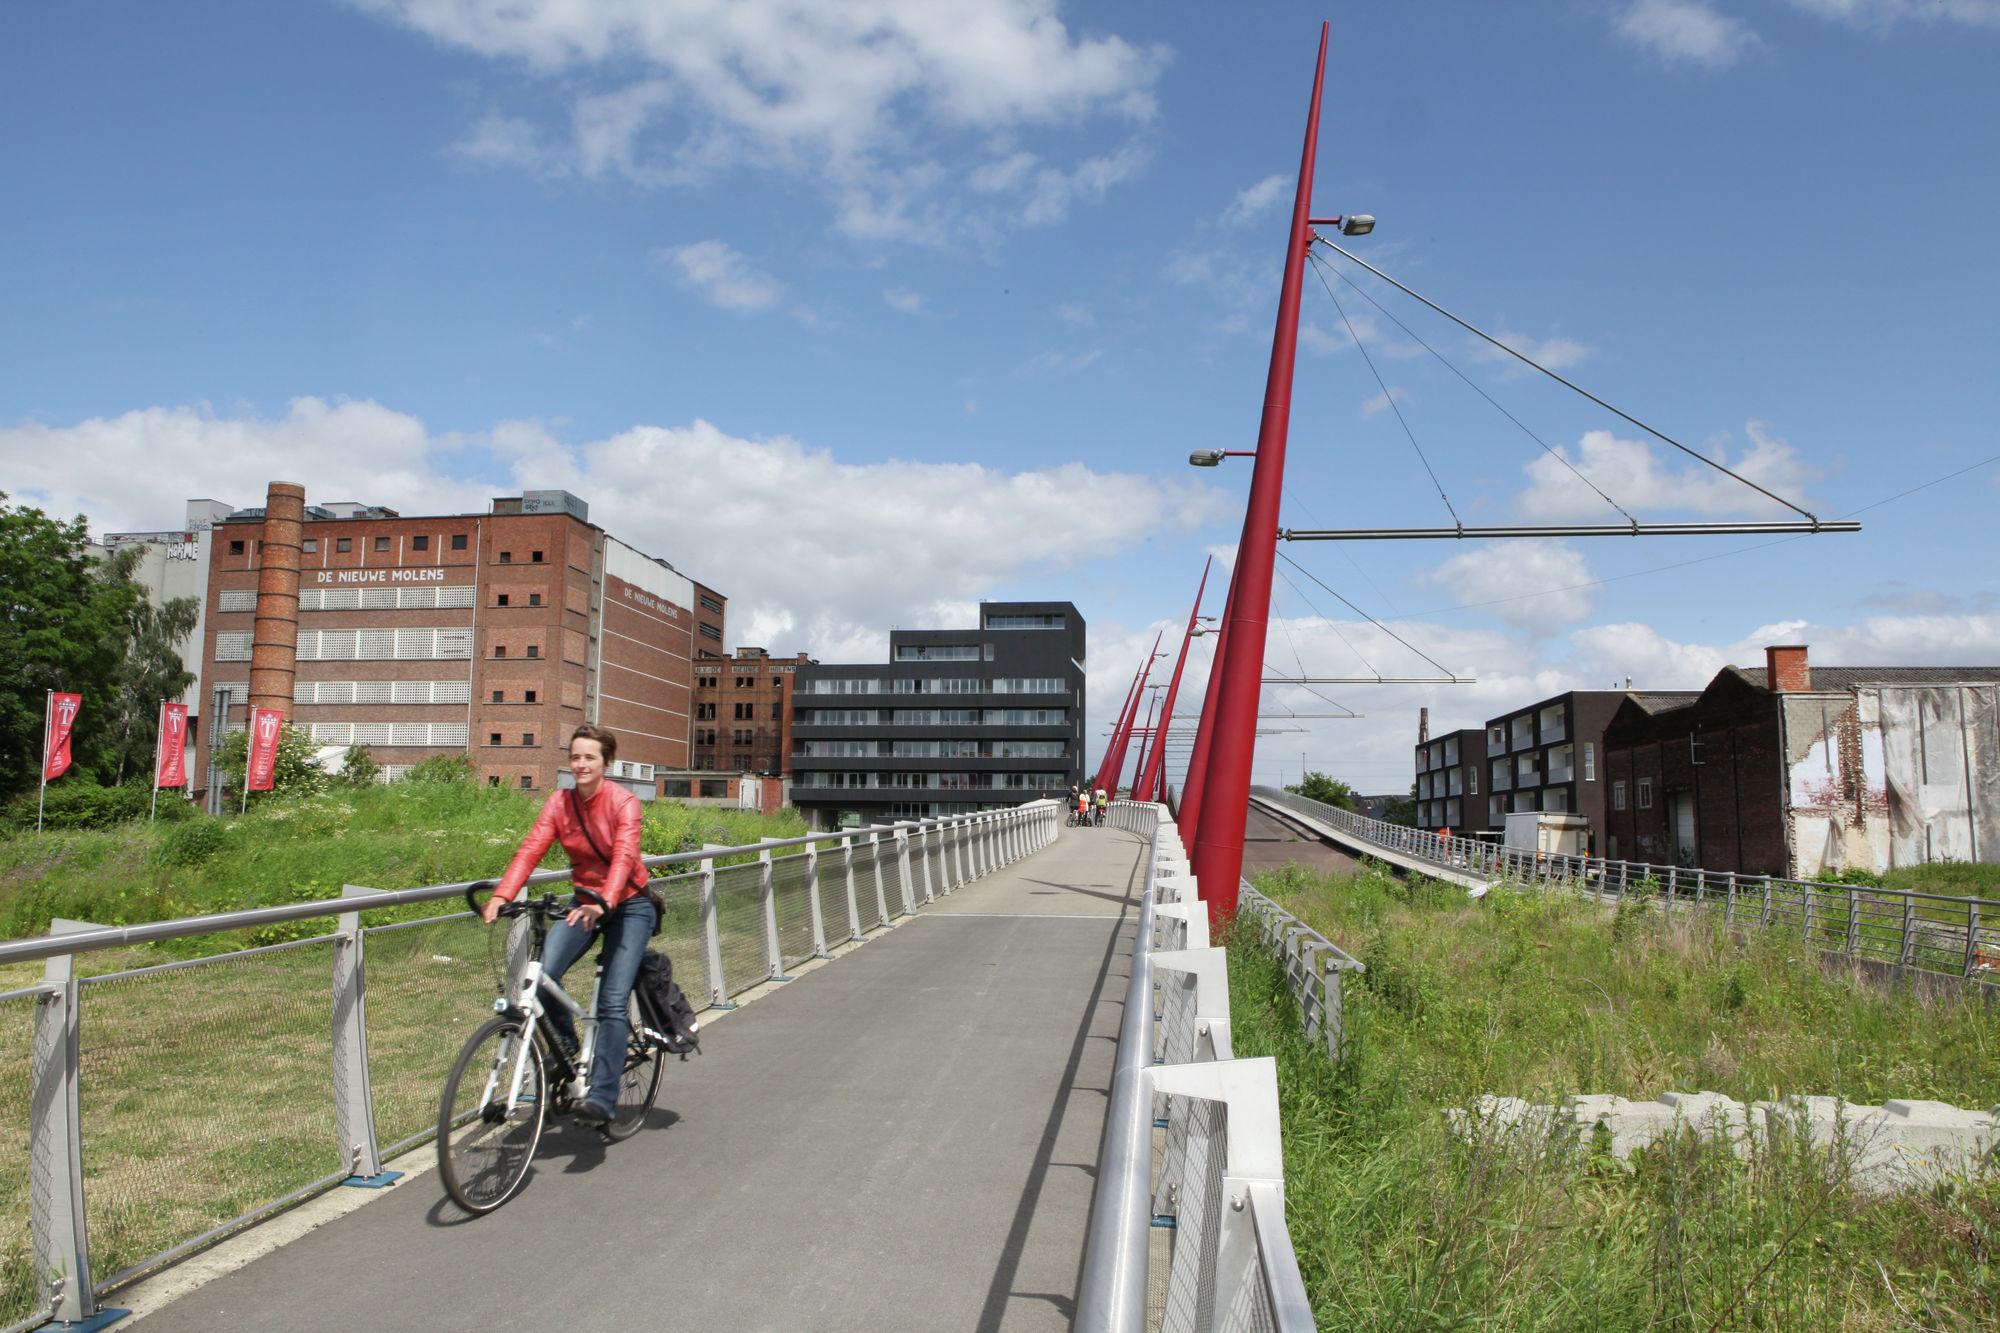 gaardeniersbrug en nieuwe molens (16)©Layla Aerts.jpg